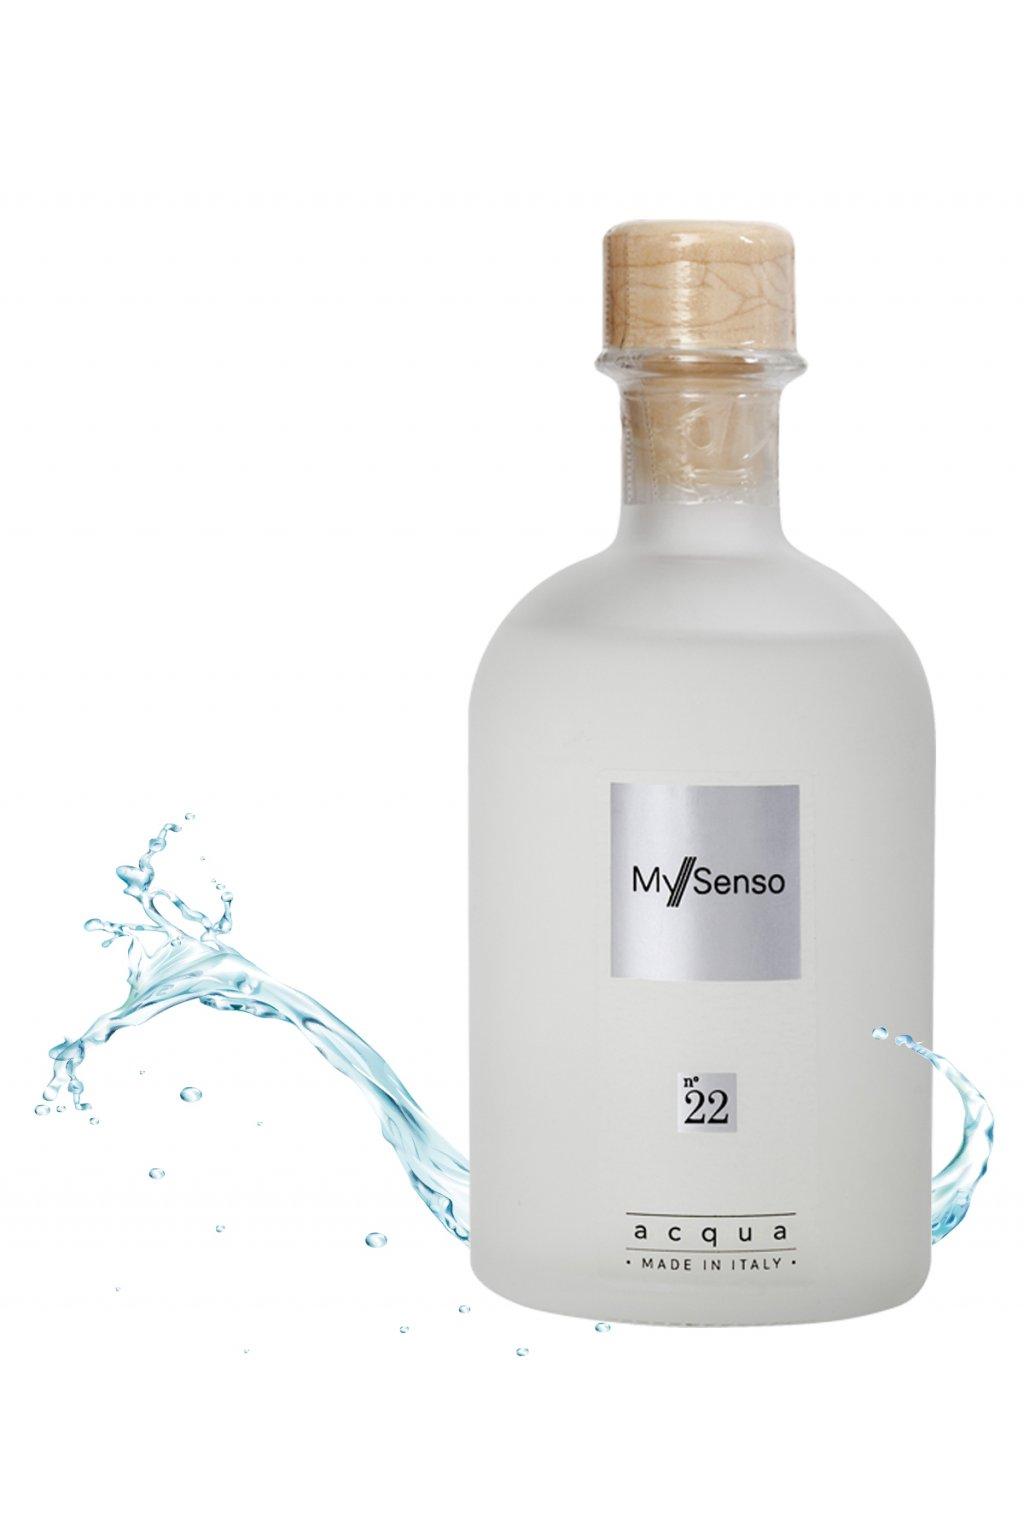 180 my senso nahradni napln pro aromaticky difuzer n 22 acqua vune more 240ml